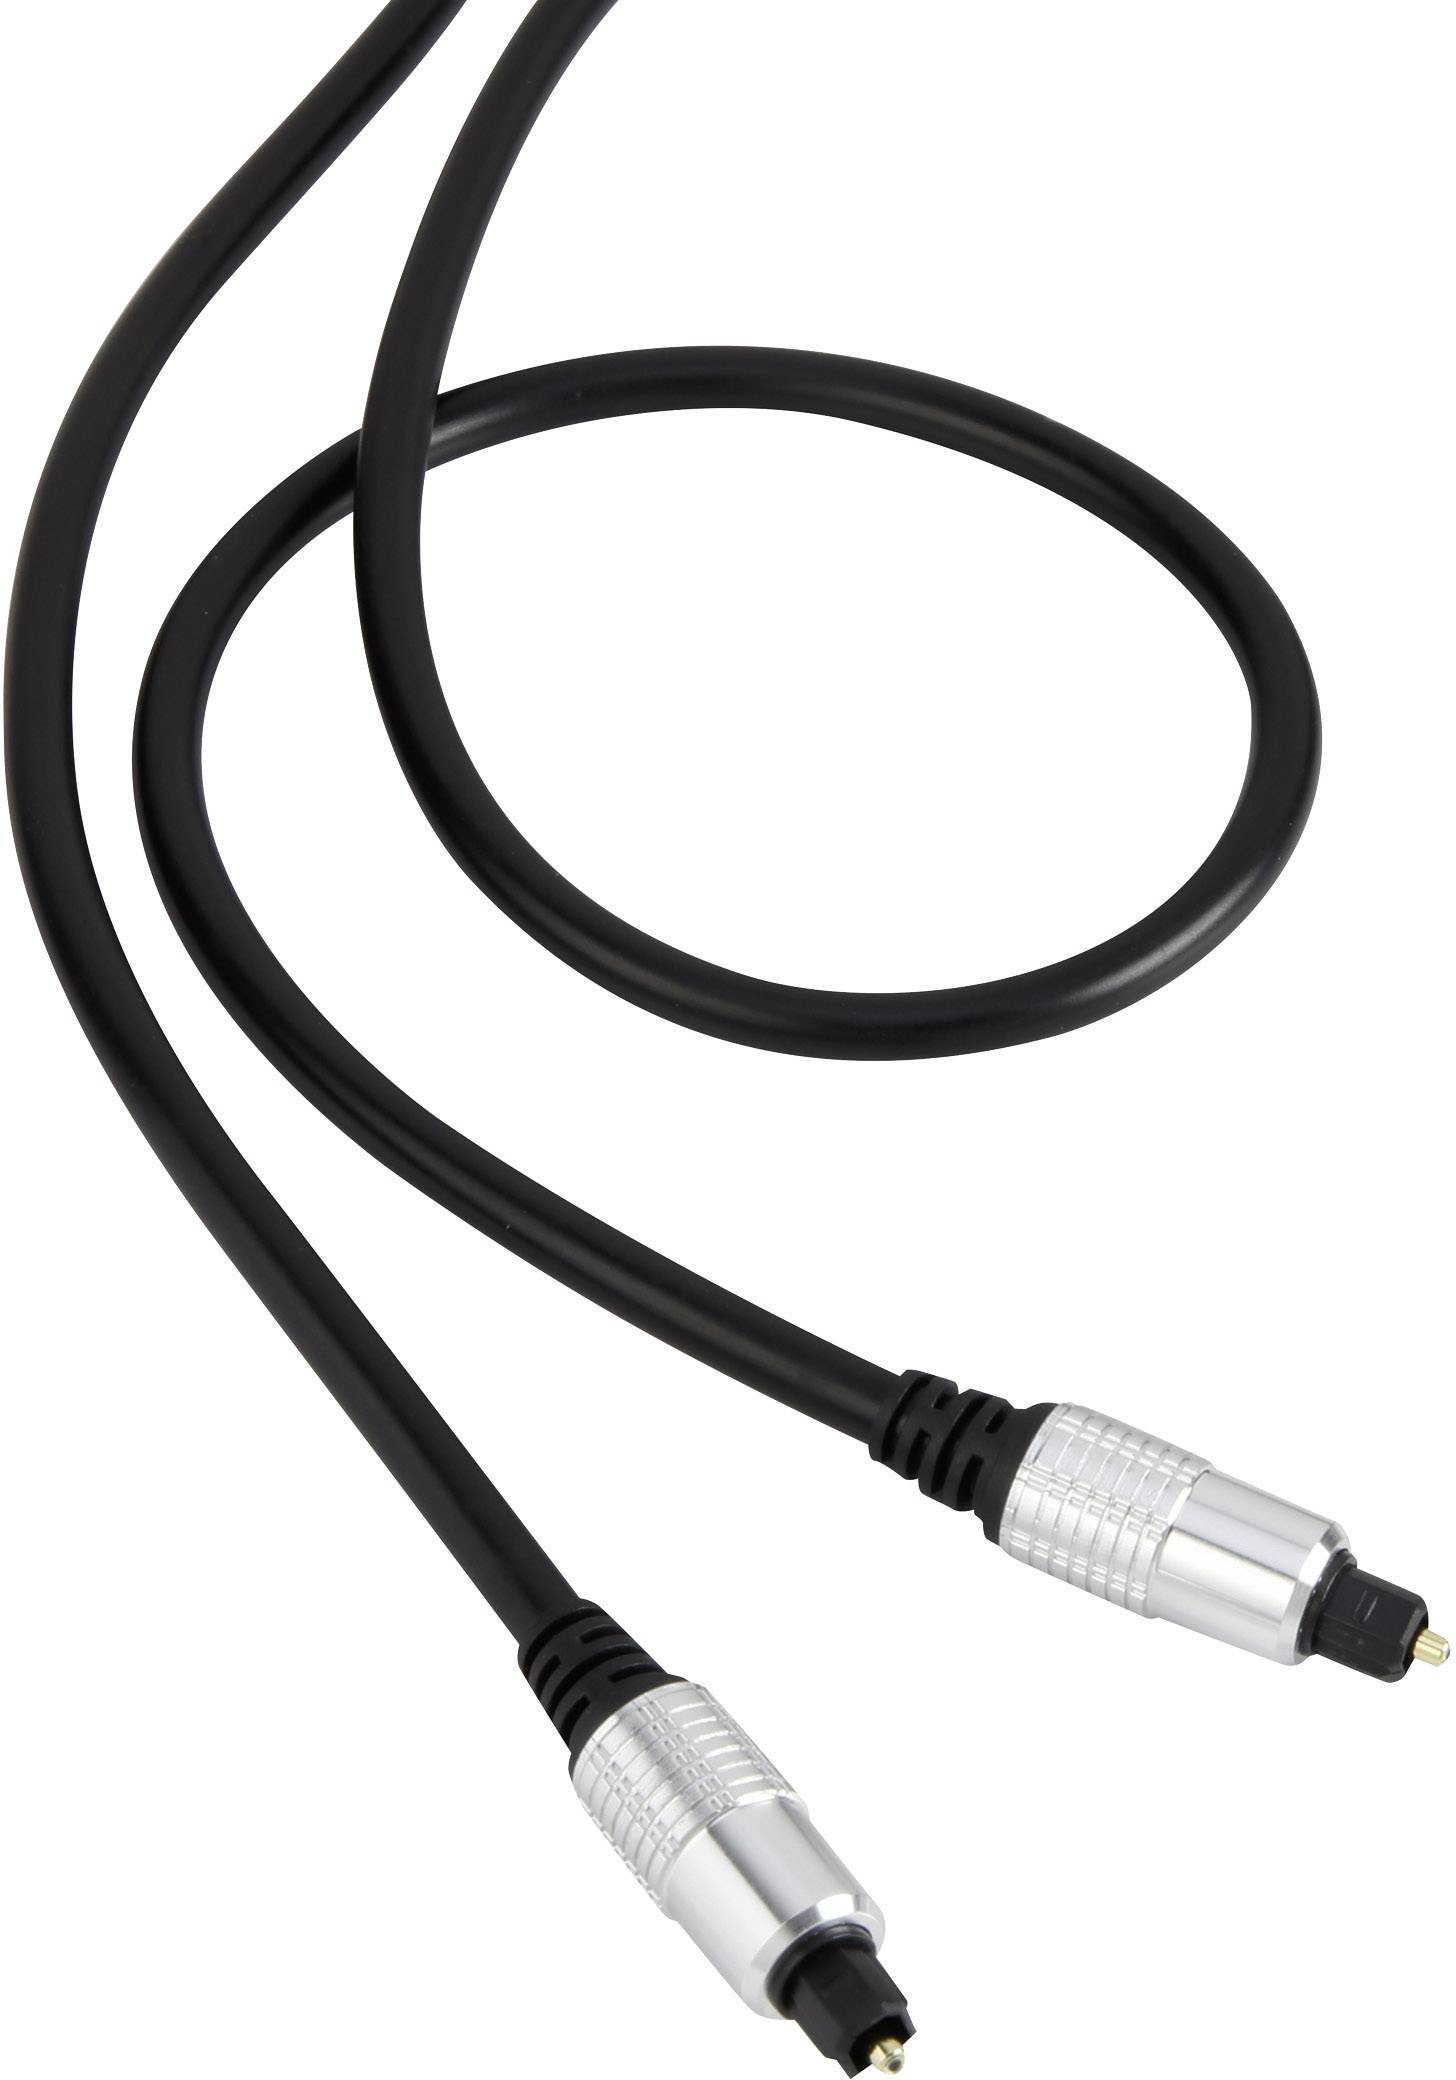 Digitálny audio kábel Toslink SpeaKa, 1 m, čierna